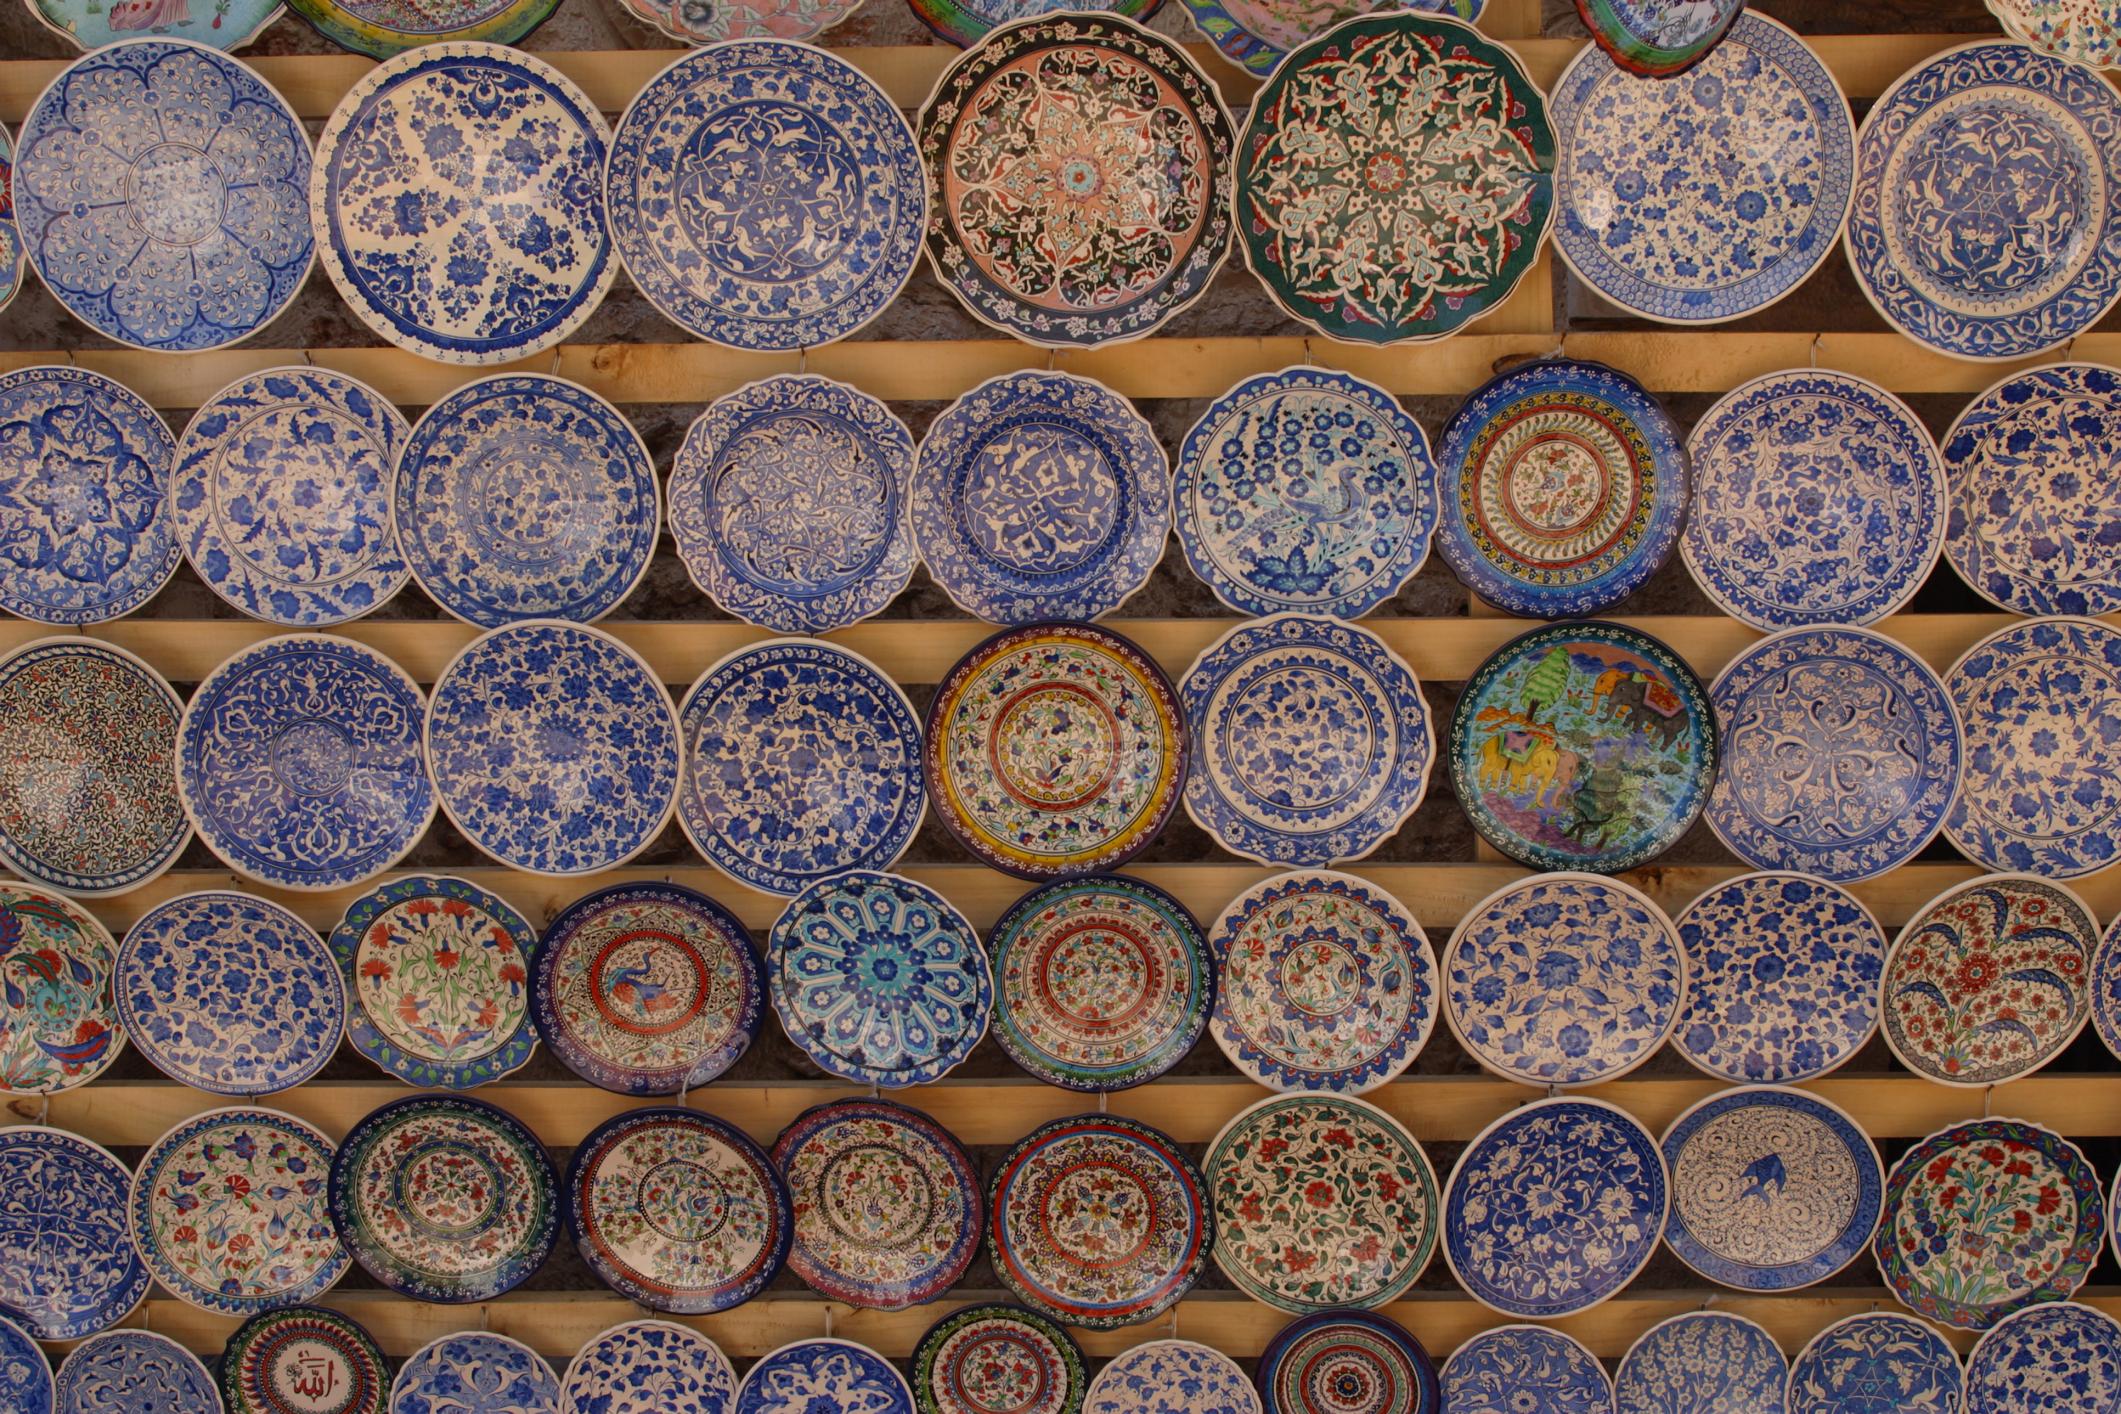 How to Identify Imari Porcelain